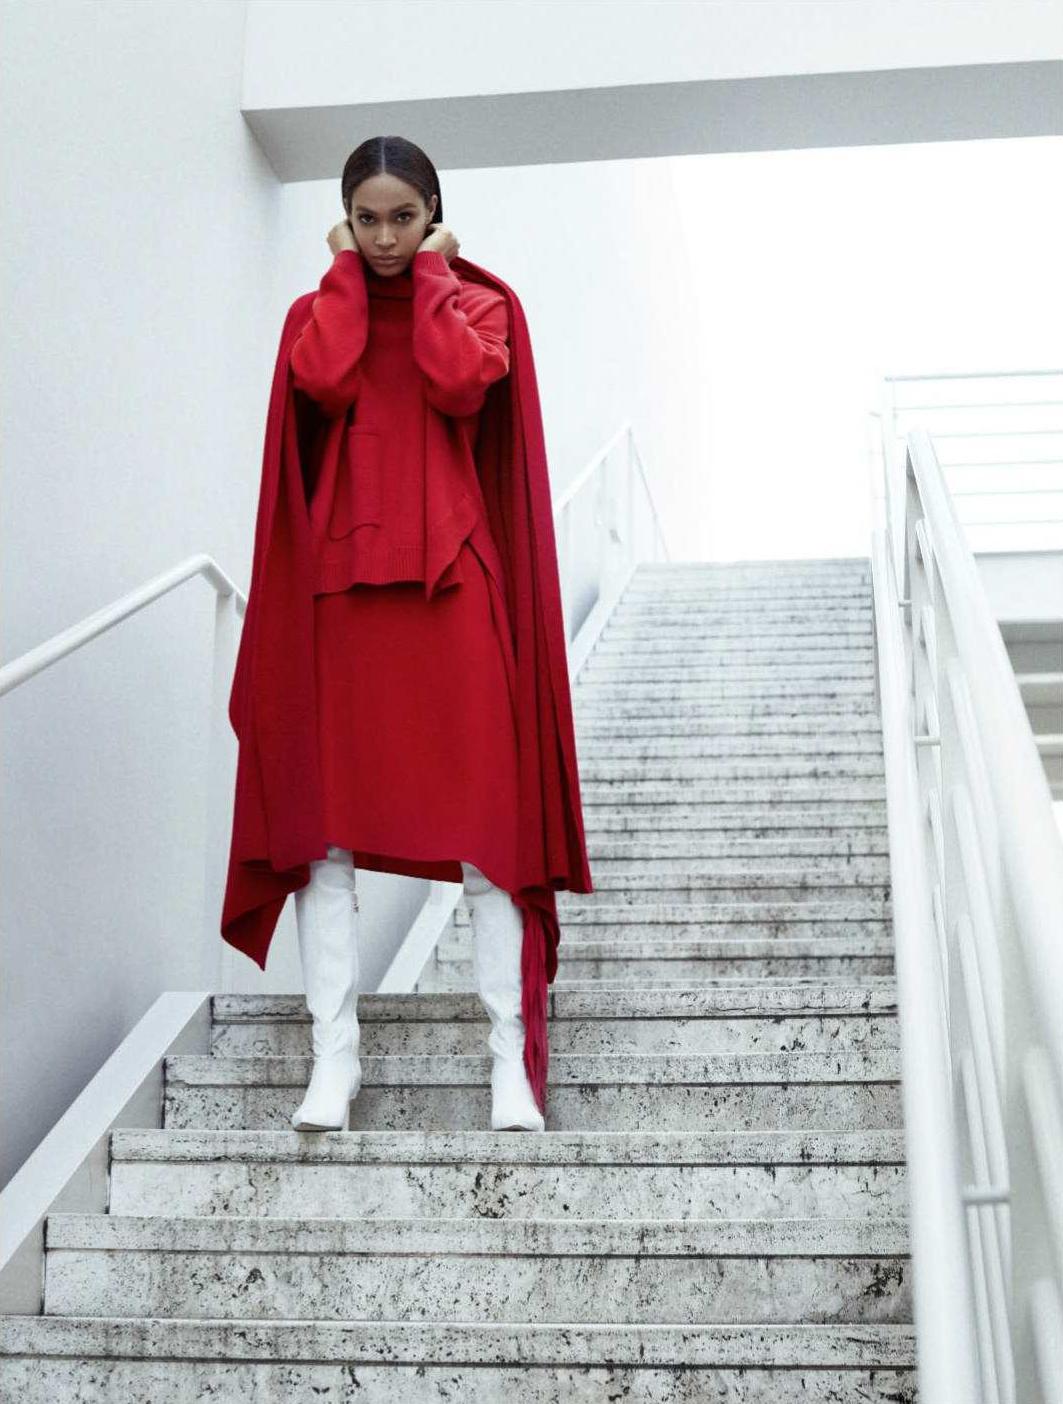 Joan Smalls by Xavi Gordo for Elle Russia October 2018 (1).jpg